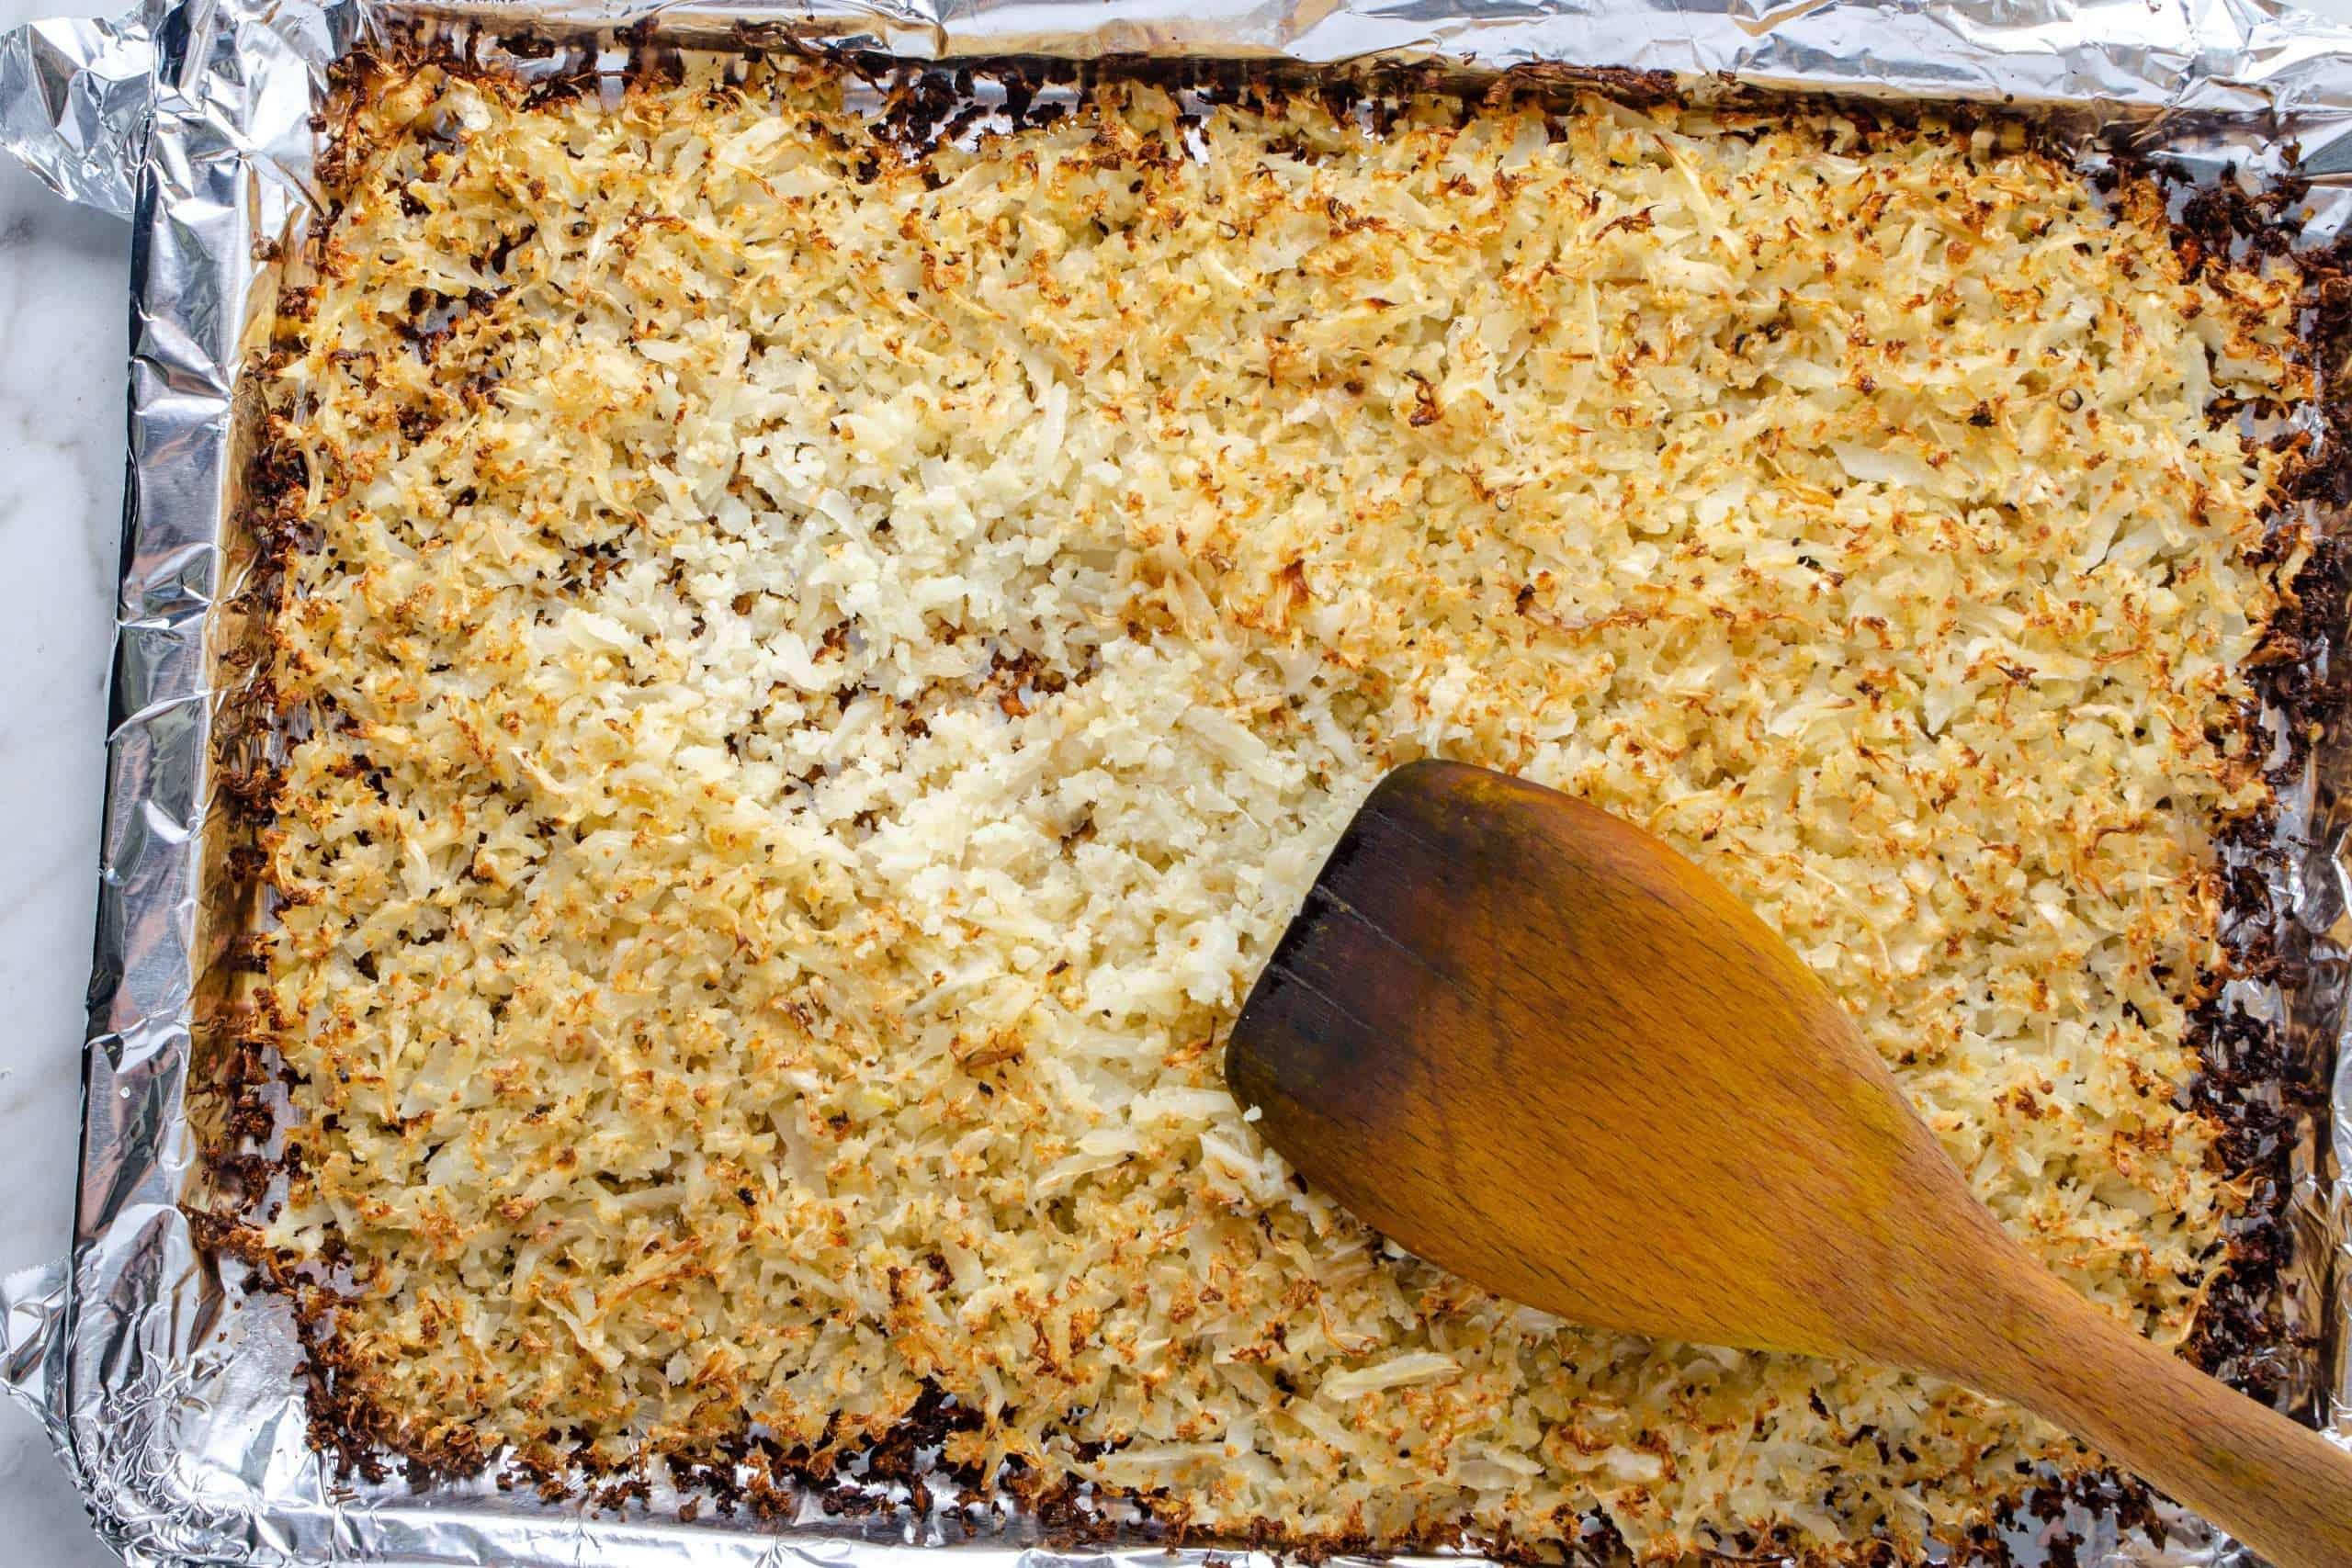 Roasted cauliflower rice on a baking sheet